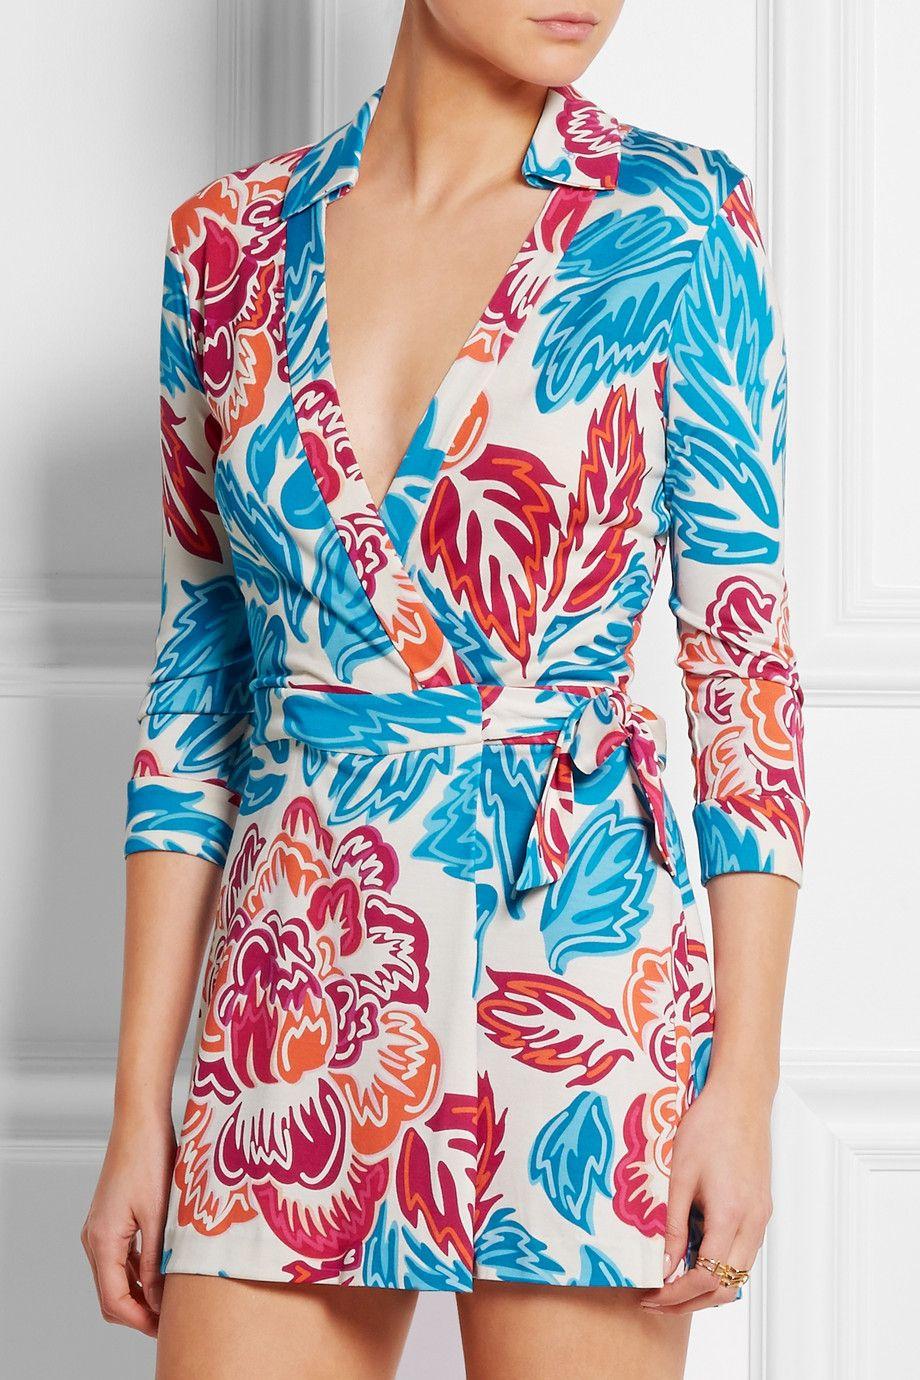 Diane von Furstenberg | Celeste floral-print silk-jersey playsuit | NET-A-PORTER.COM